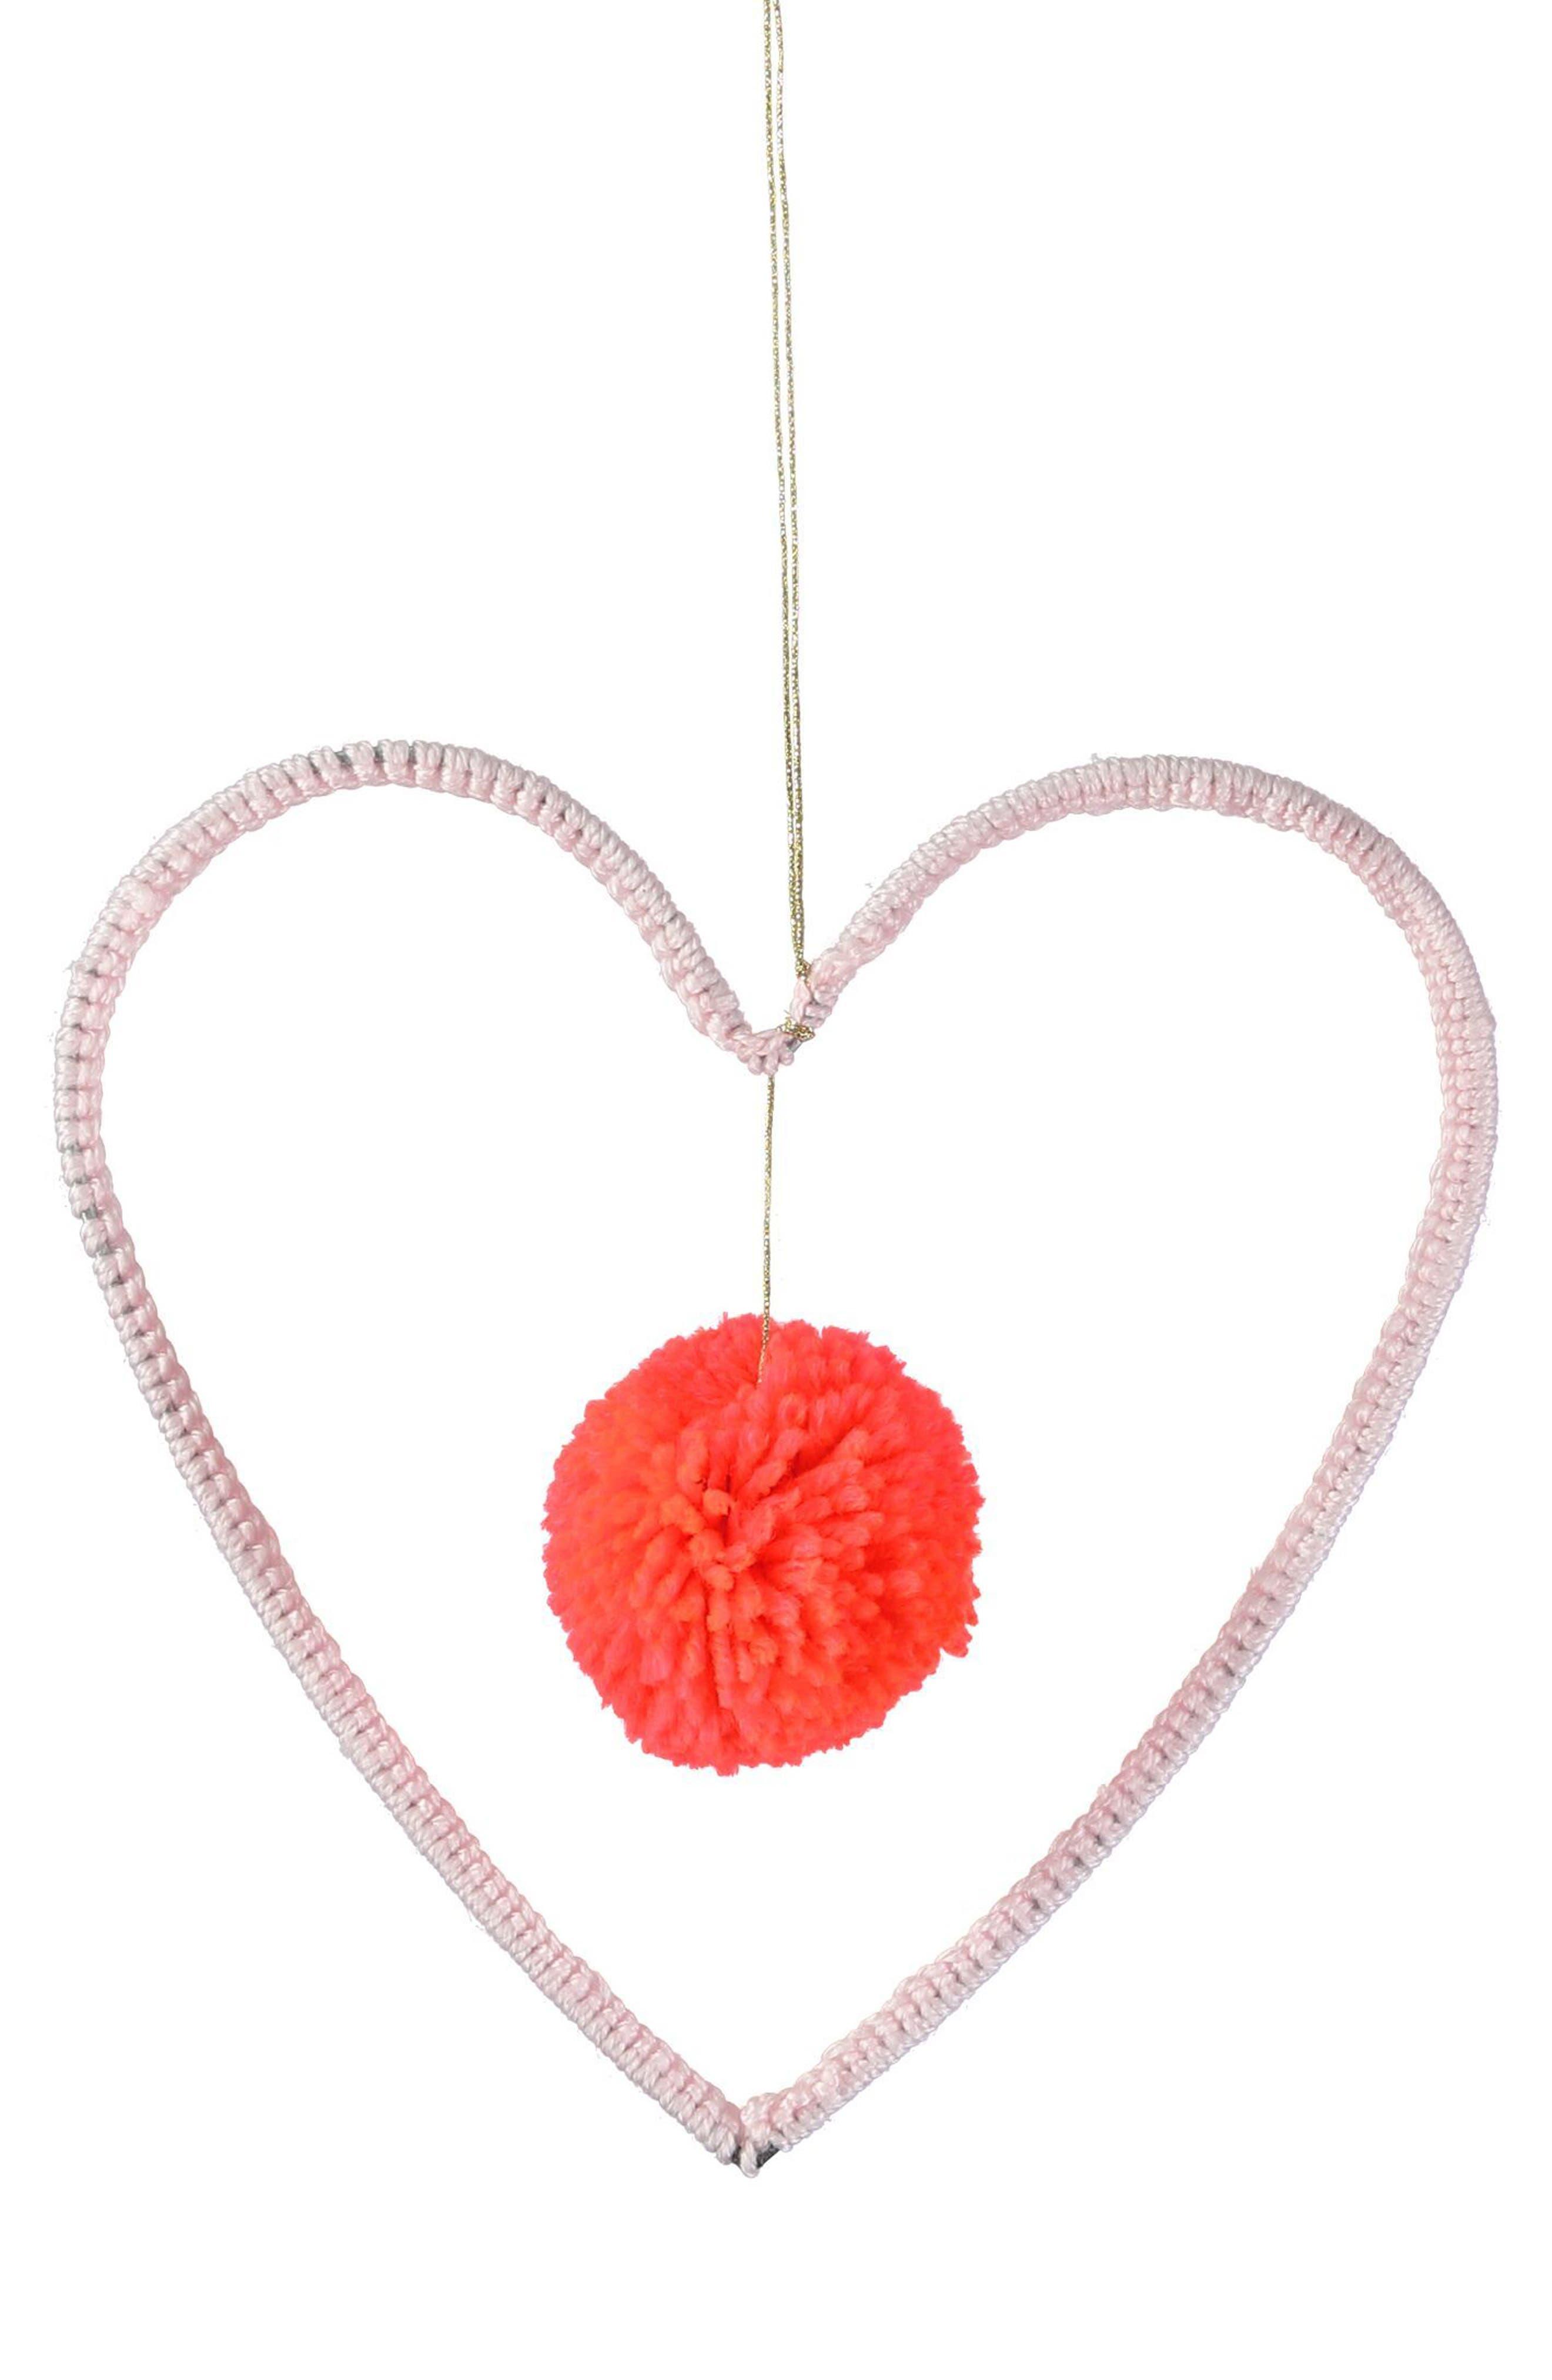 Hanging Heart & Pom Wall Art,                             Main thumbnail 1, color,                             Pink Multi